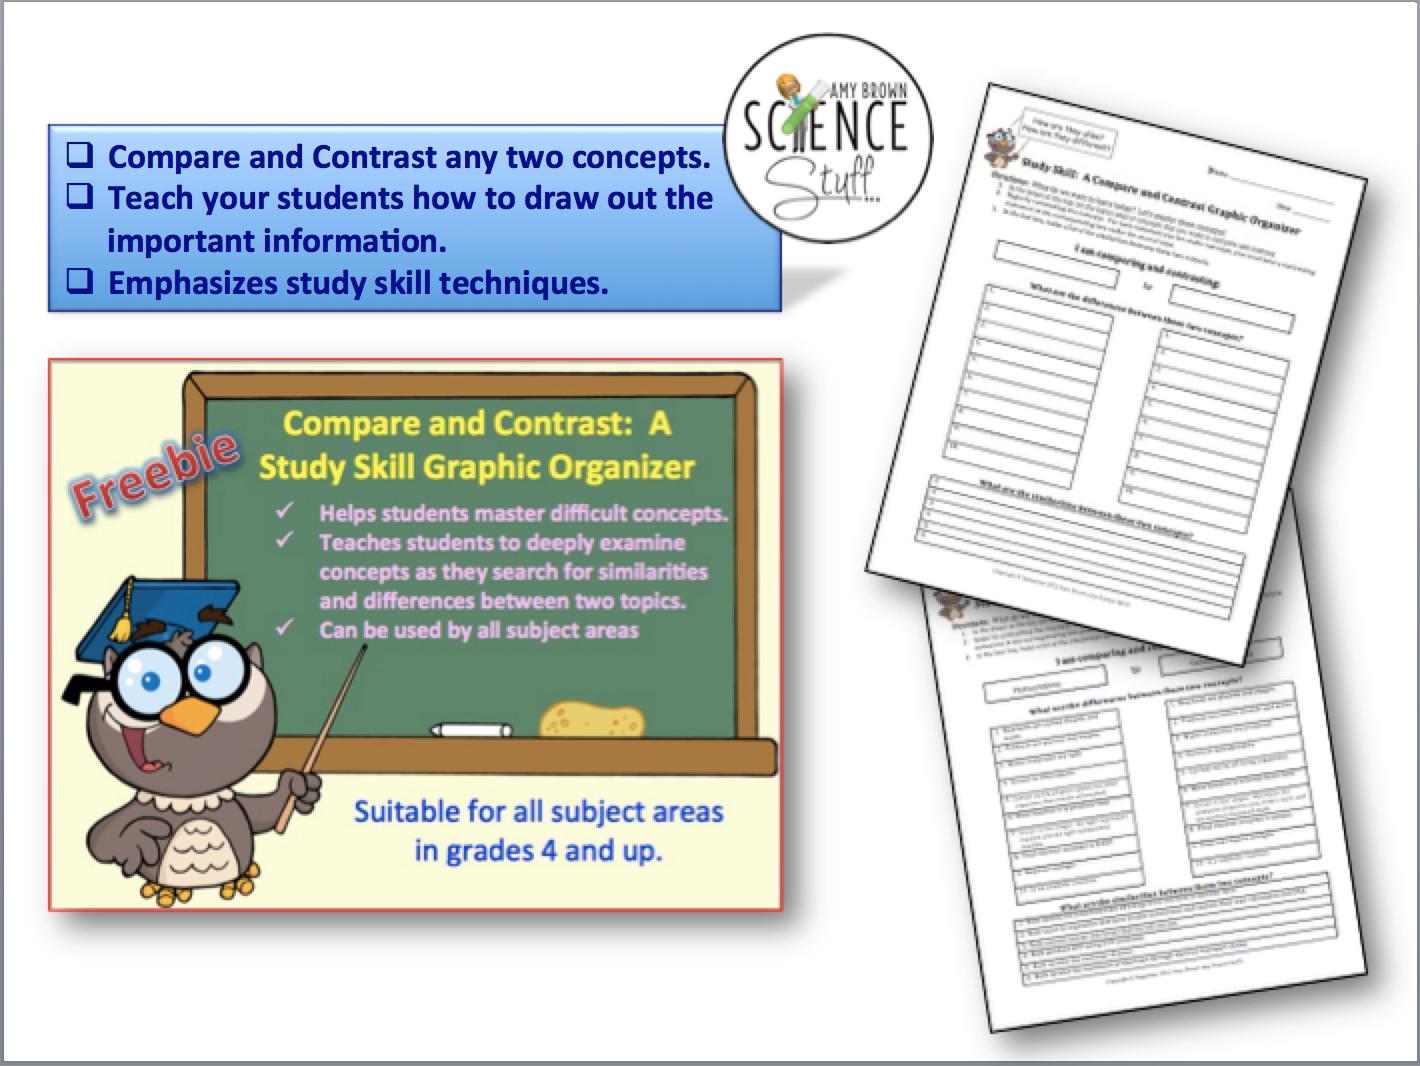 Free Study Skill Graphic Organizer Compare And Contrast